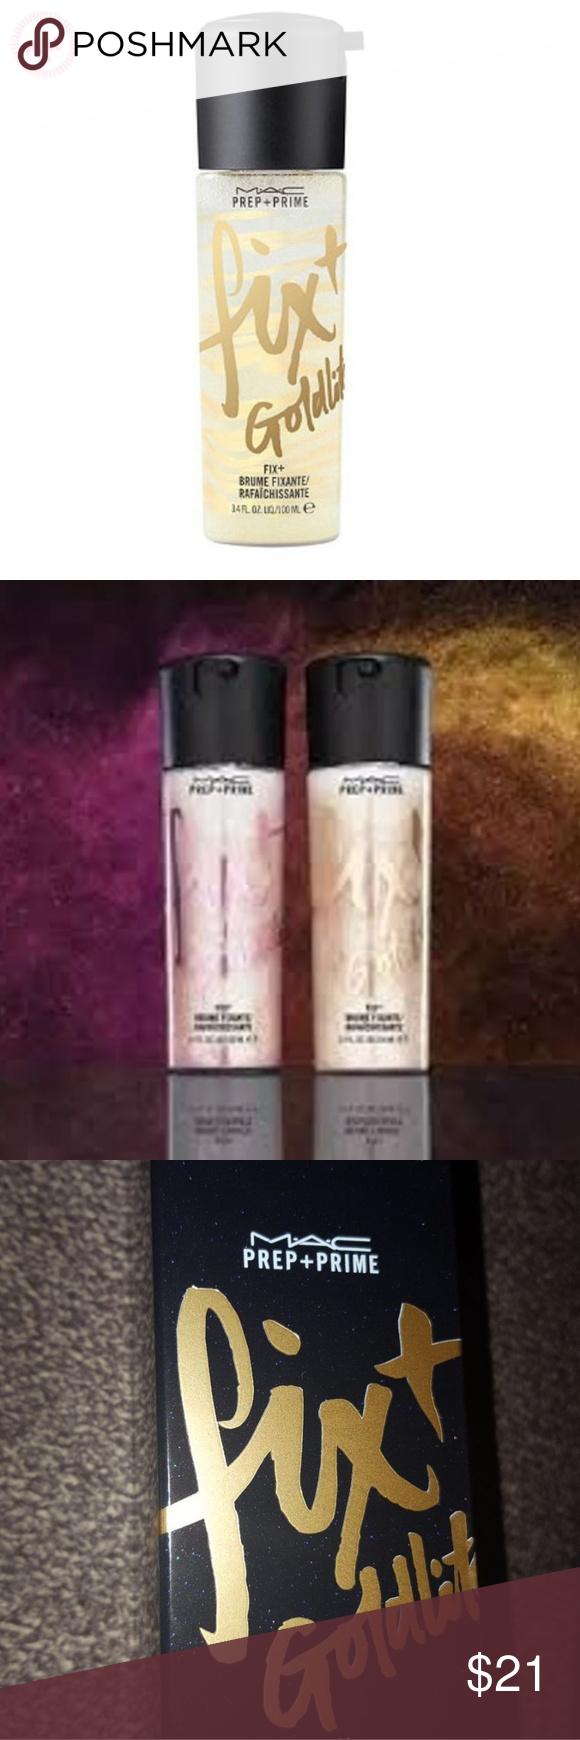 BNIB MAC Cosmetics Fix Plus Goldlite Setting Spray